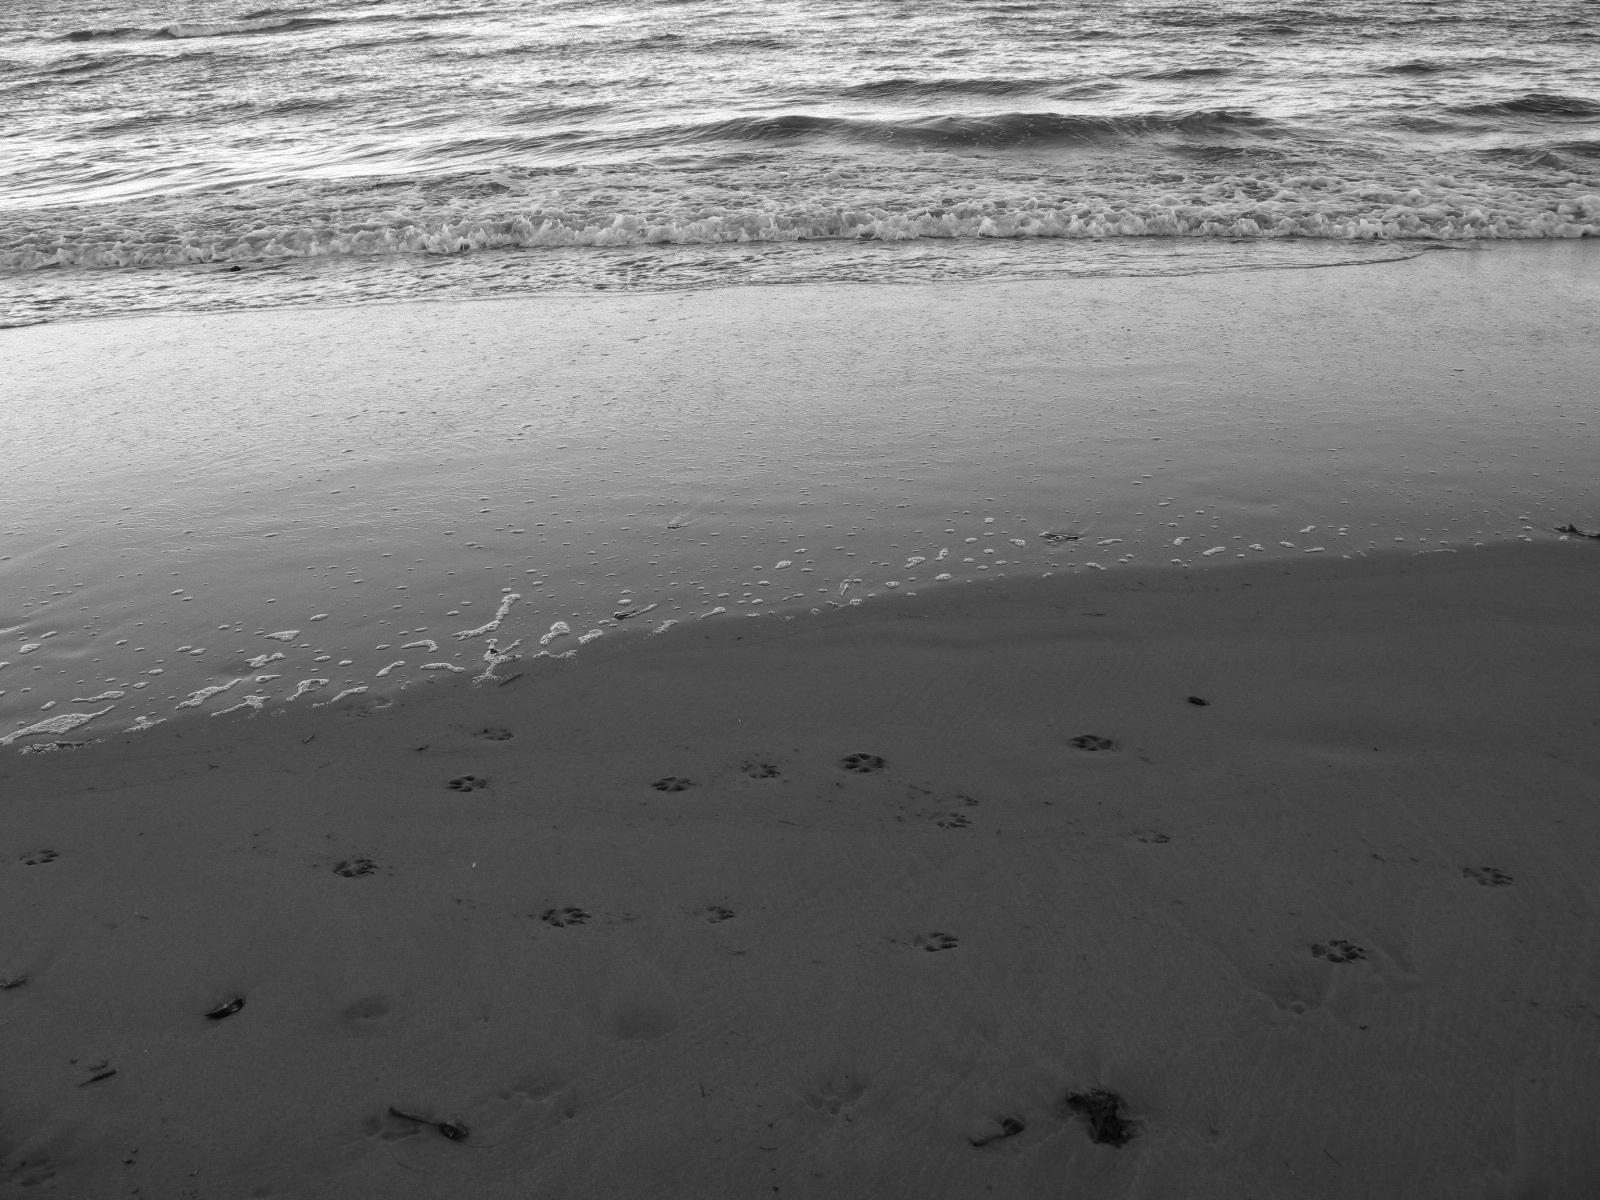 BEACH IN MACKAY, QLD, 2018